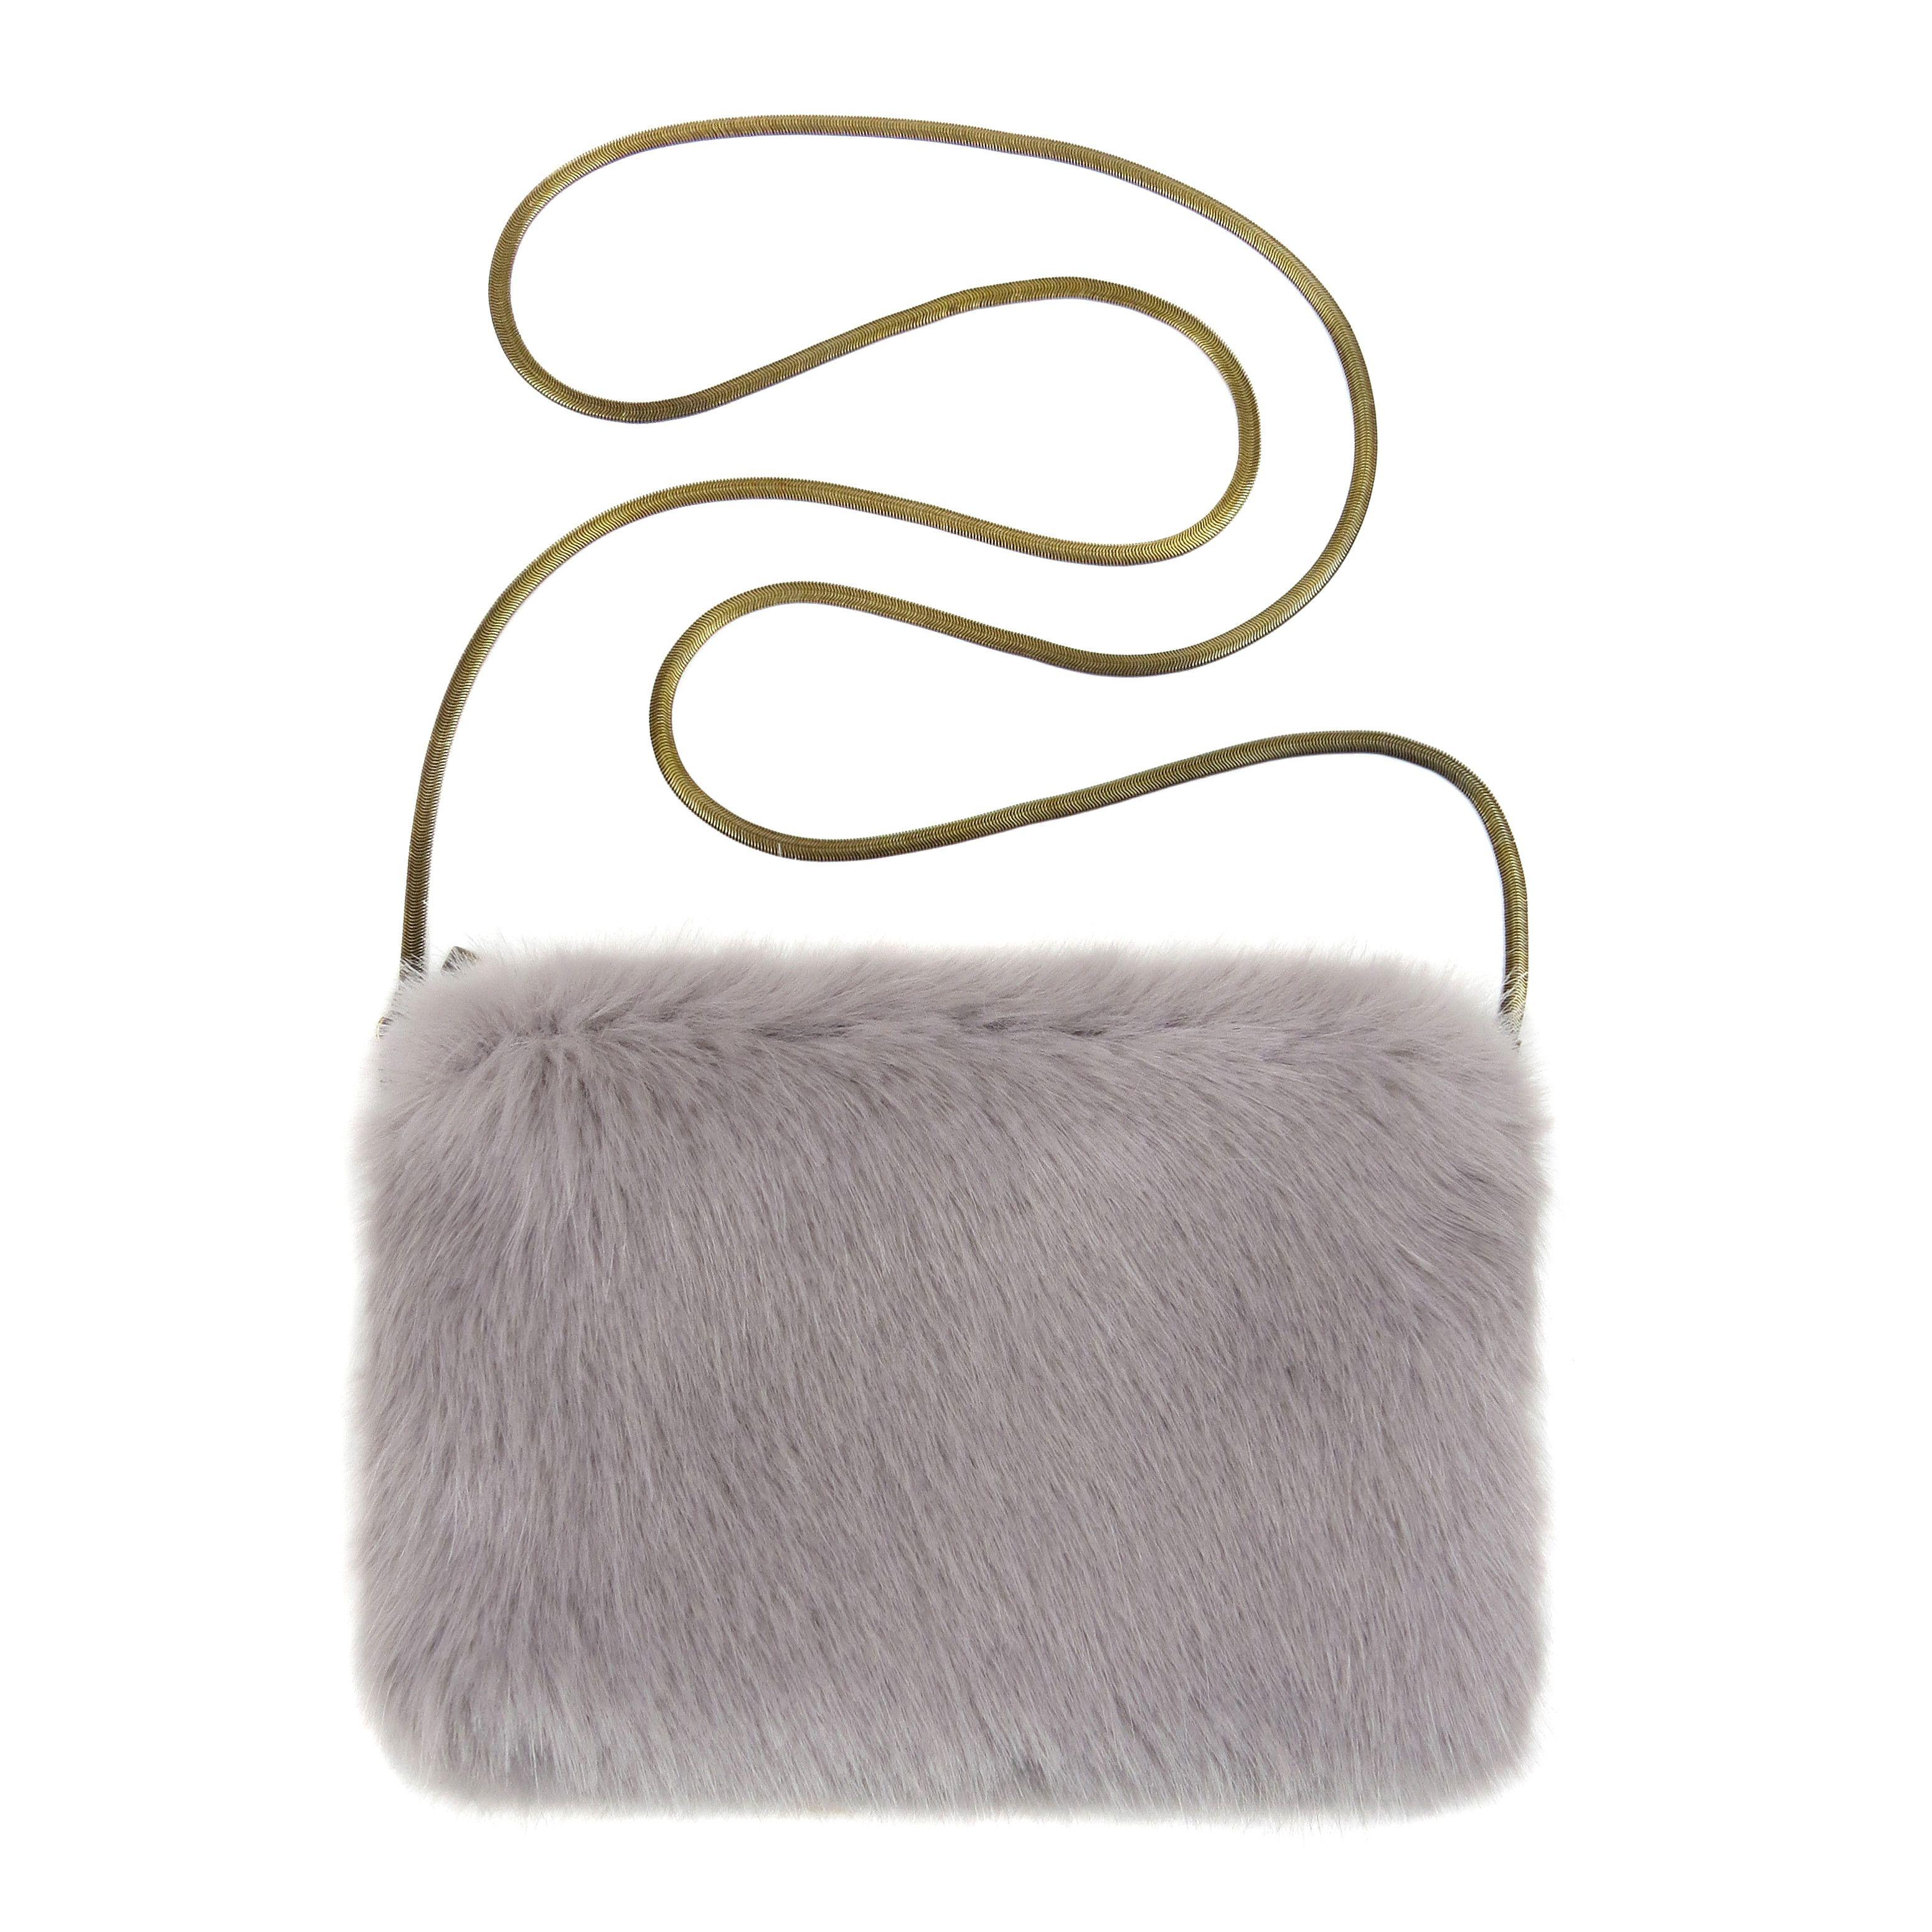 fdccdd28a92 Opal Faux Fur Bridal Chain Bag   Helen Moore   Bags   Clutches ...